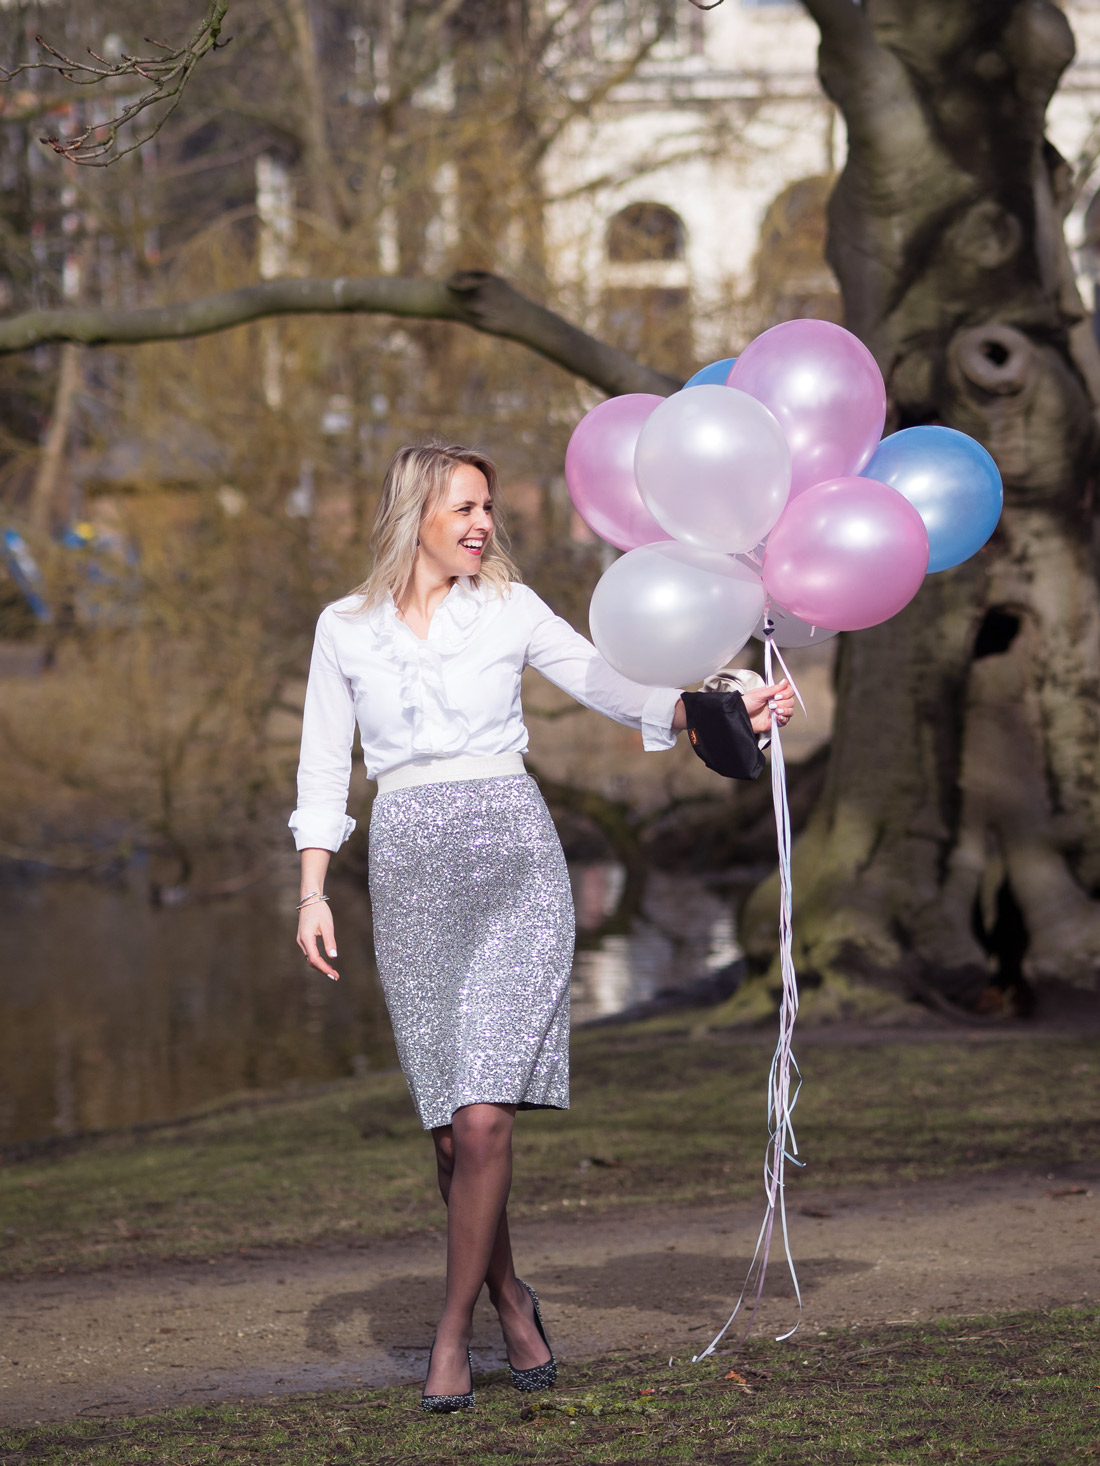 Bag-at-you---Blogger---Pregnancy-style---Marinke-Davelaar-Photography